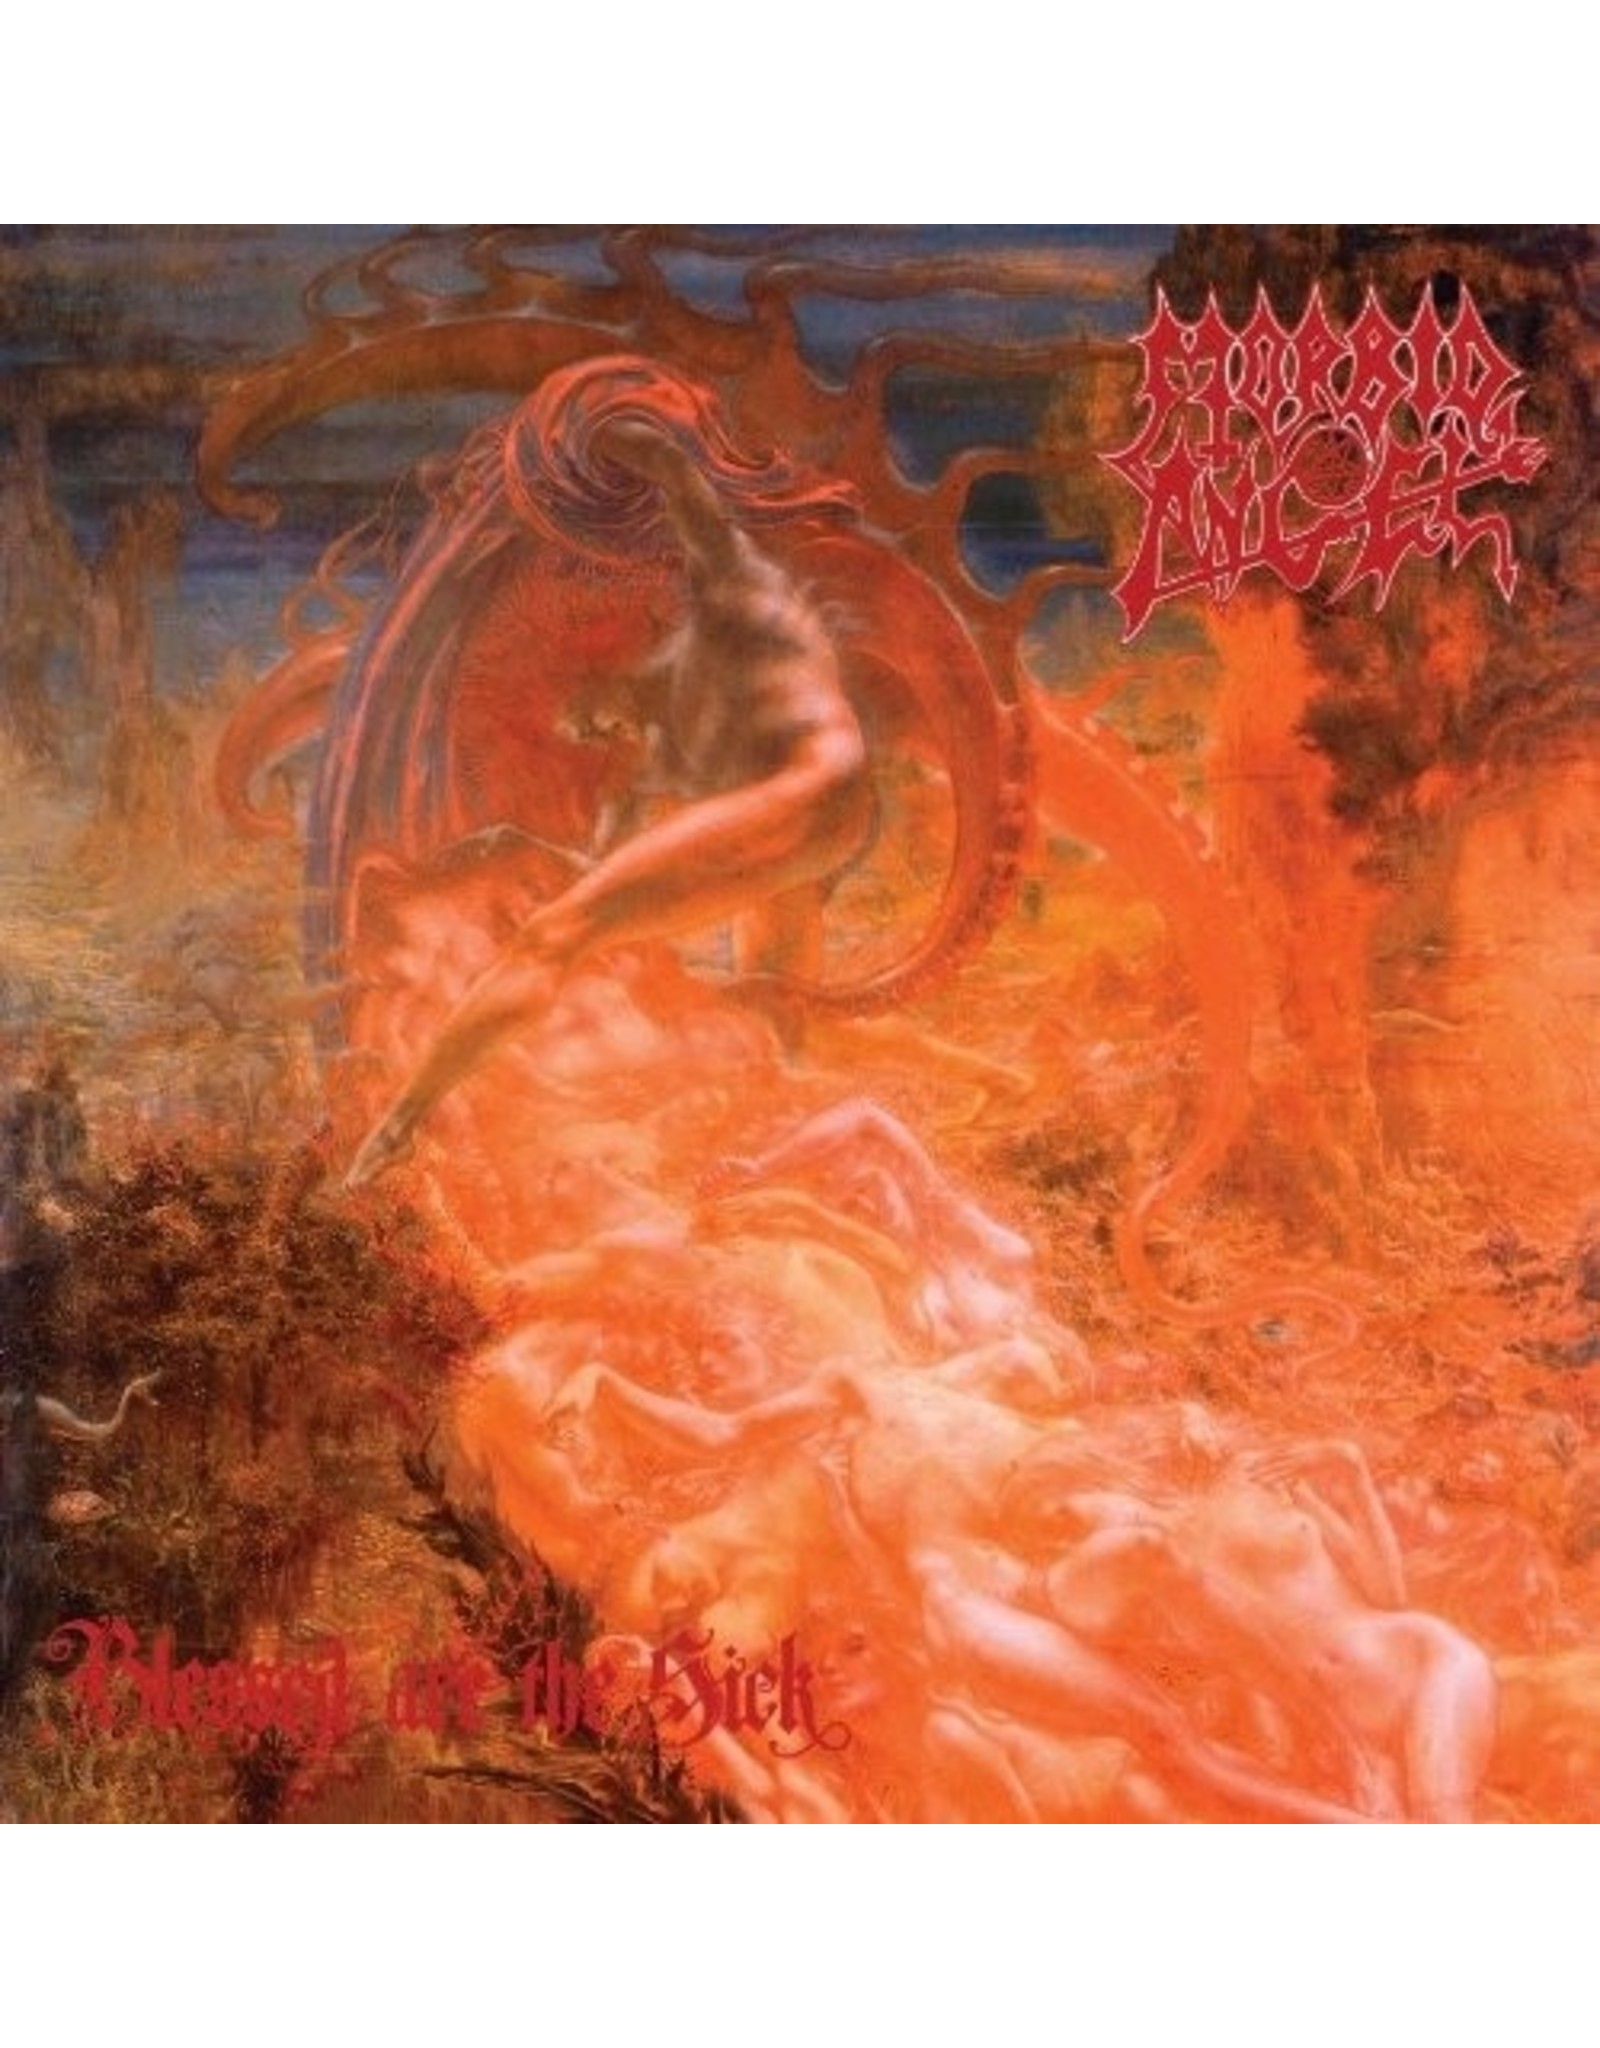 New Vinyl Morbid Angel - Blessed Are The Sick LP